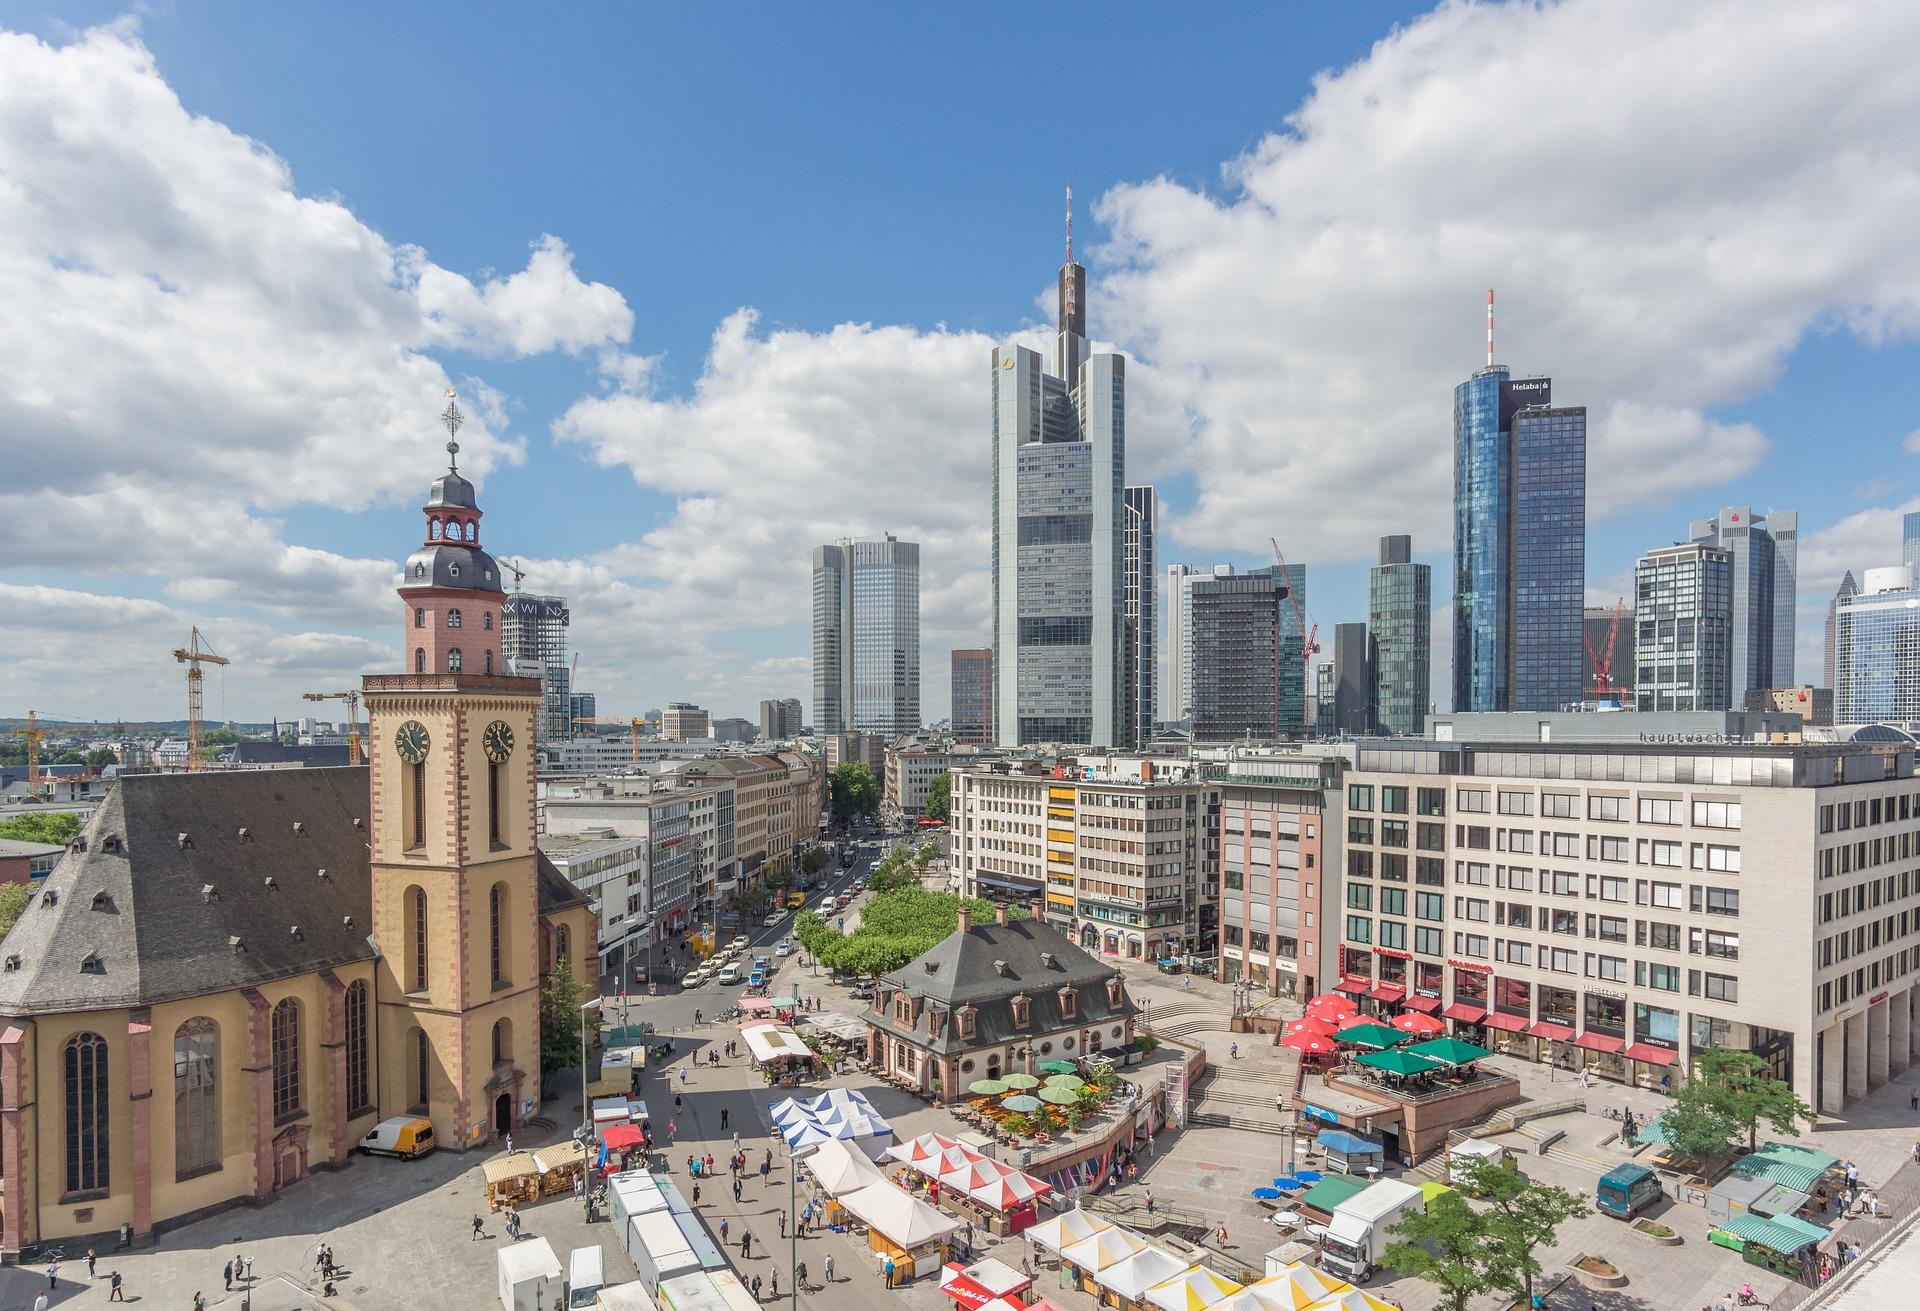 франкфурт центр міста